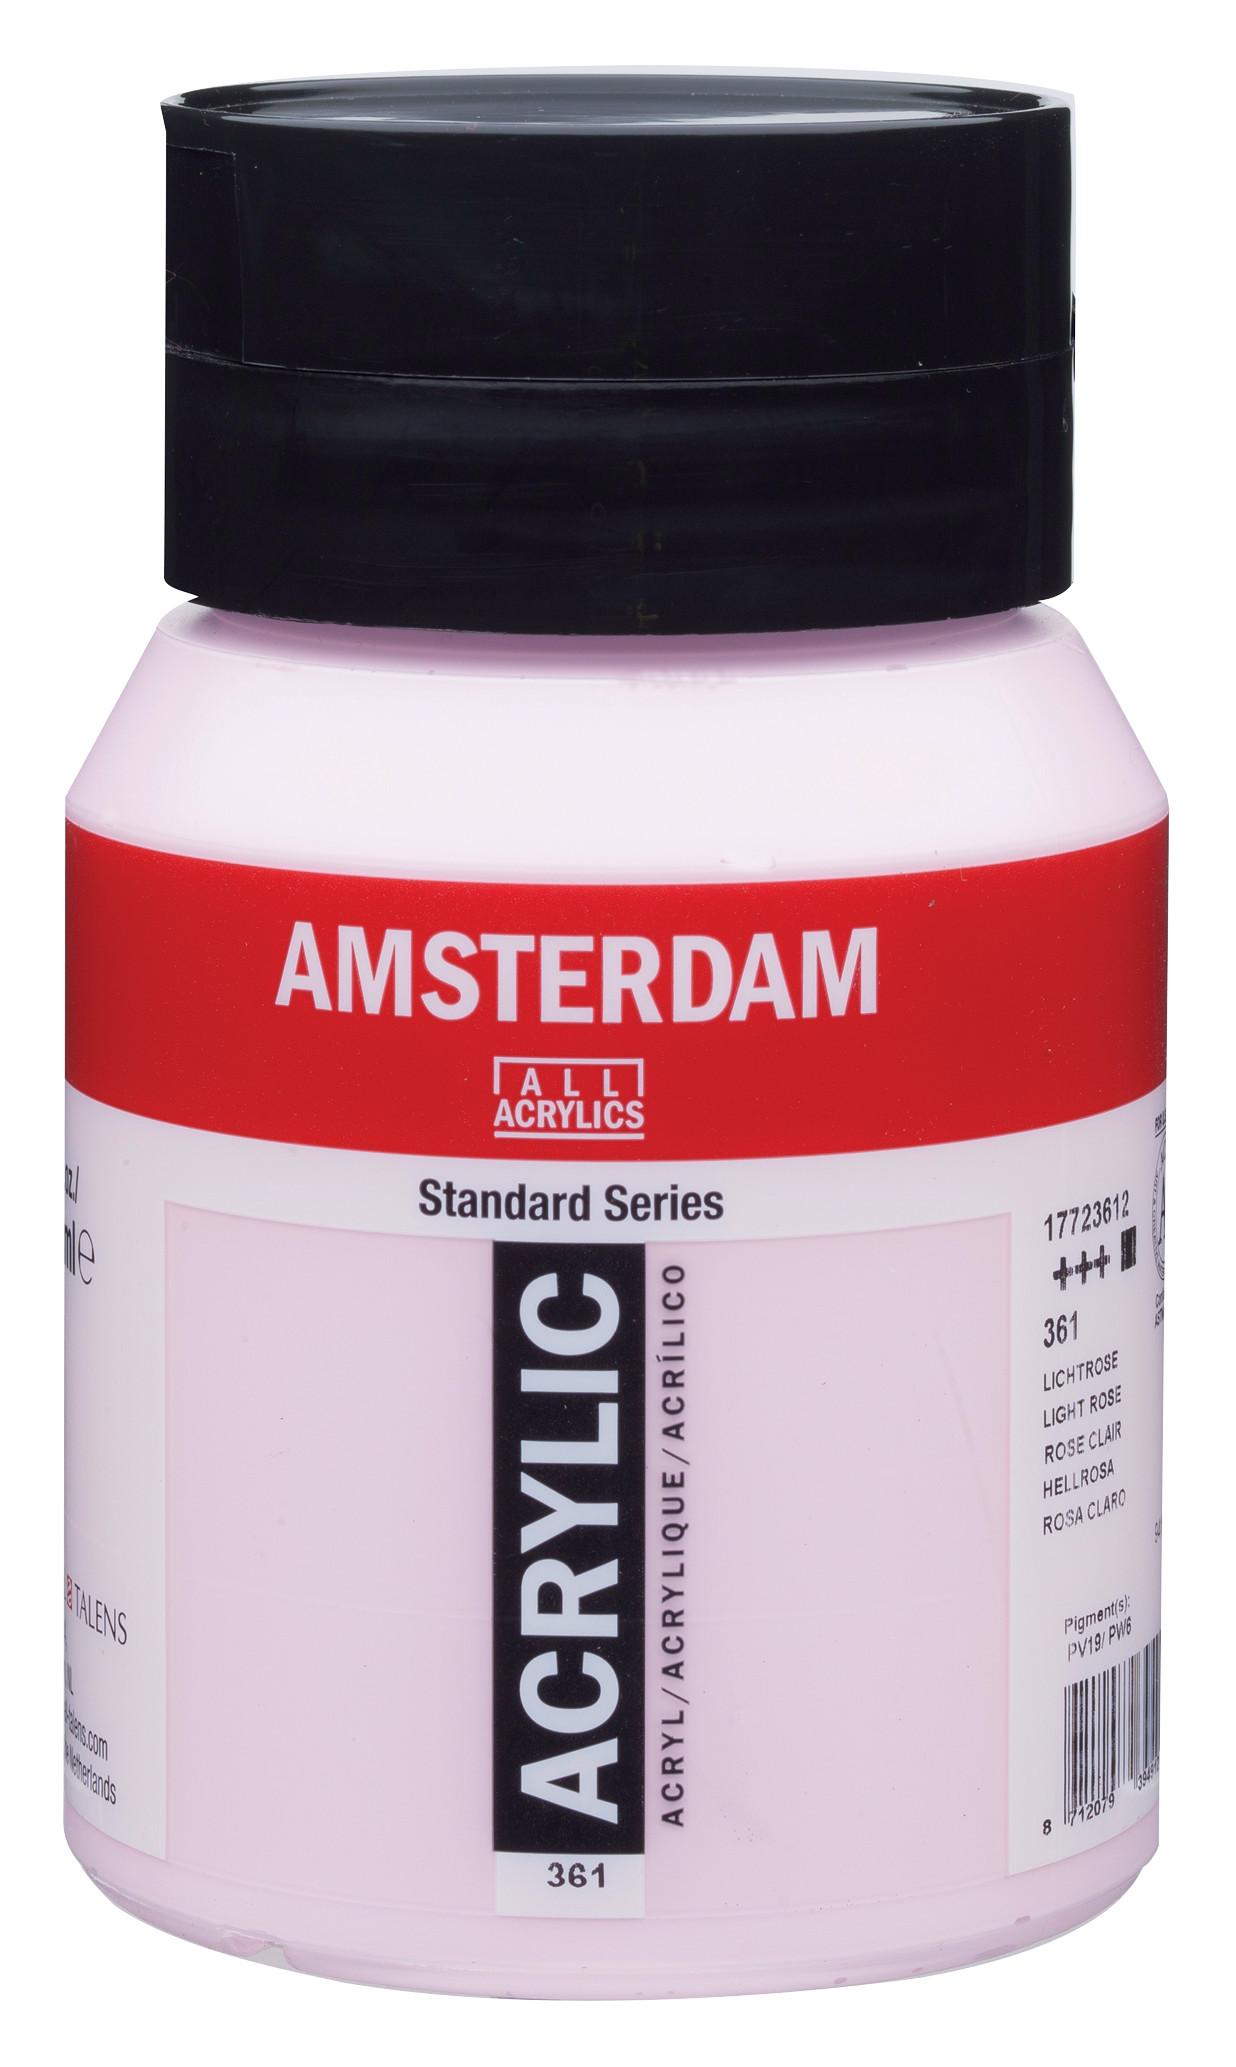 Amsterdam Standard Series Acrylic Jar 500 ml Light rose 361